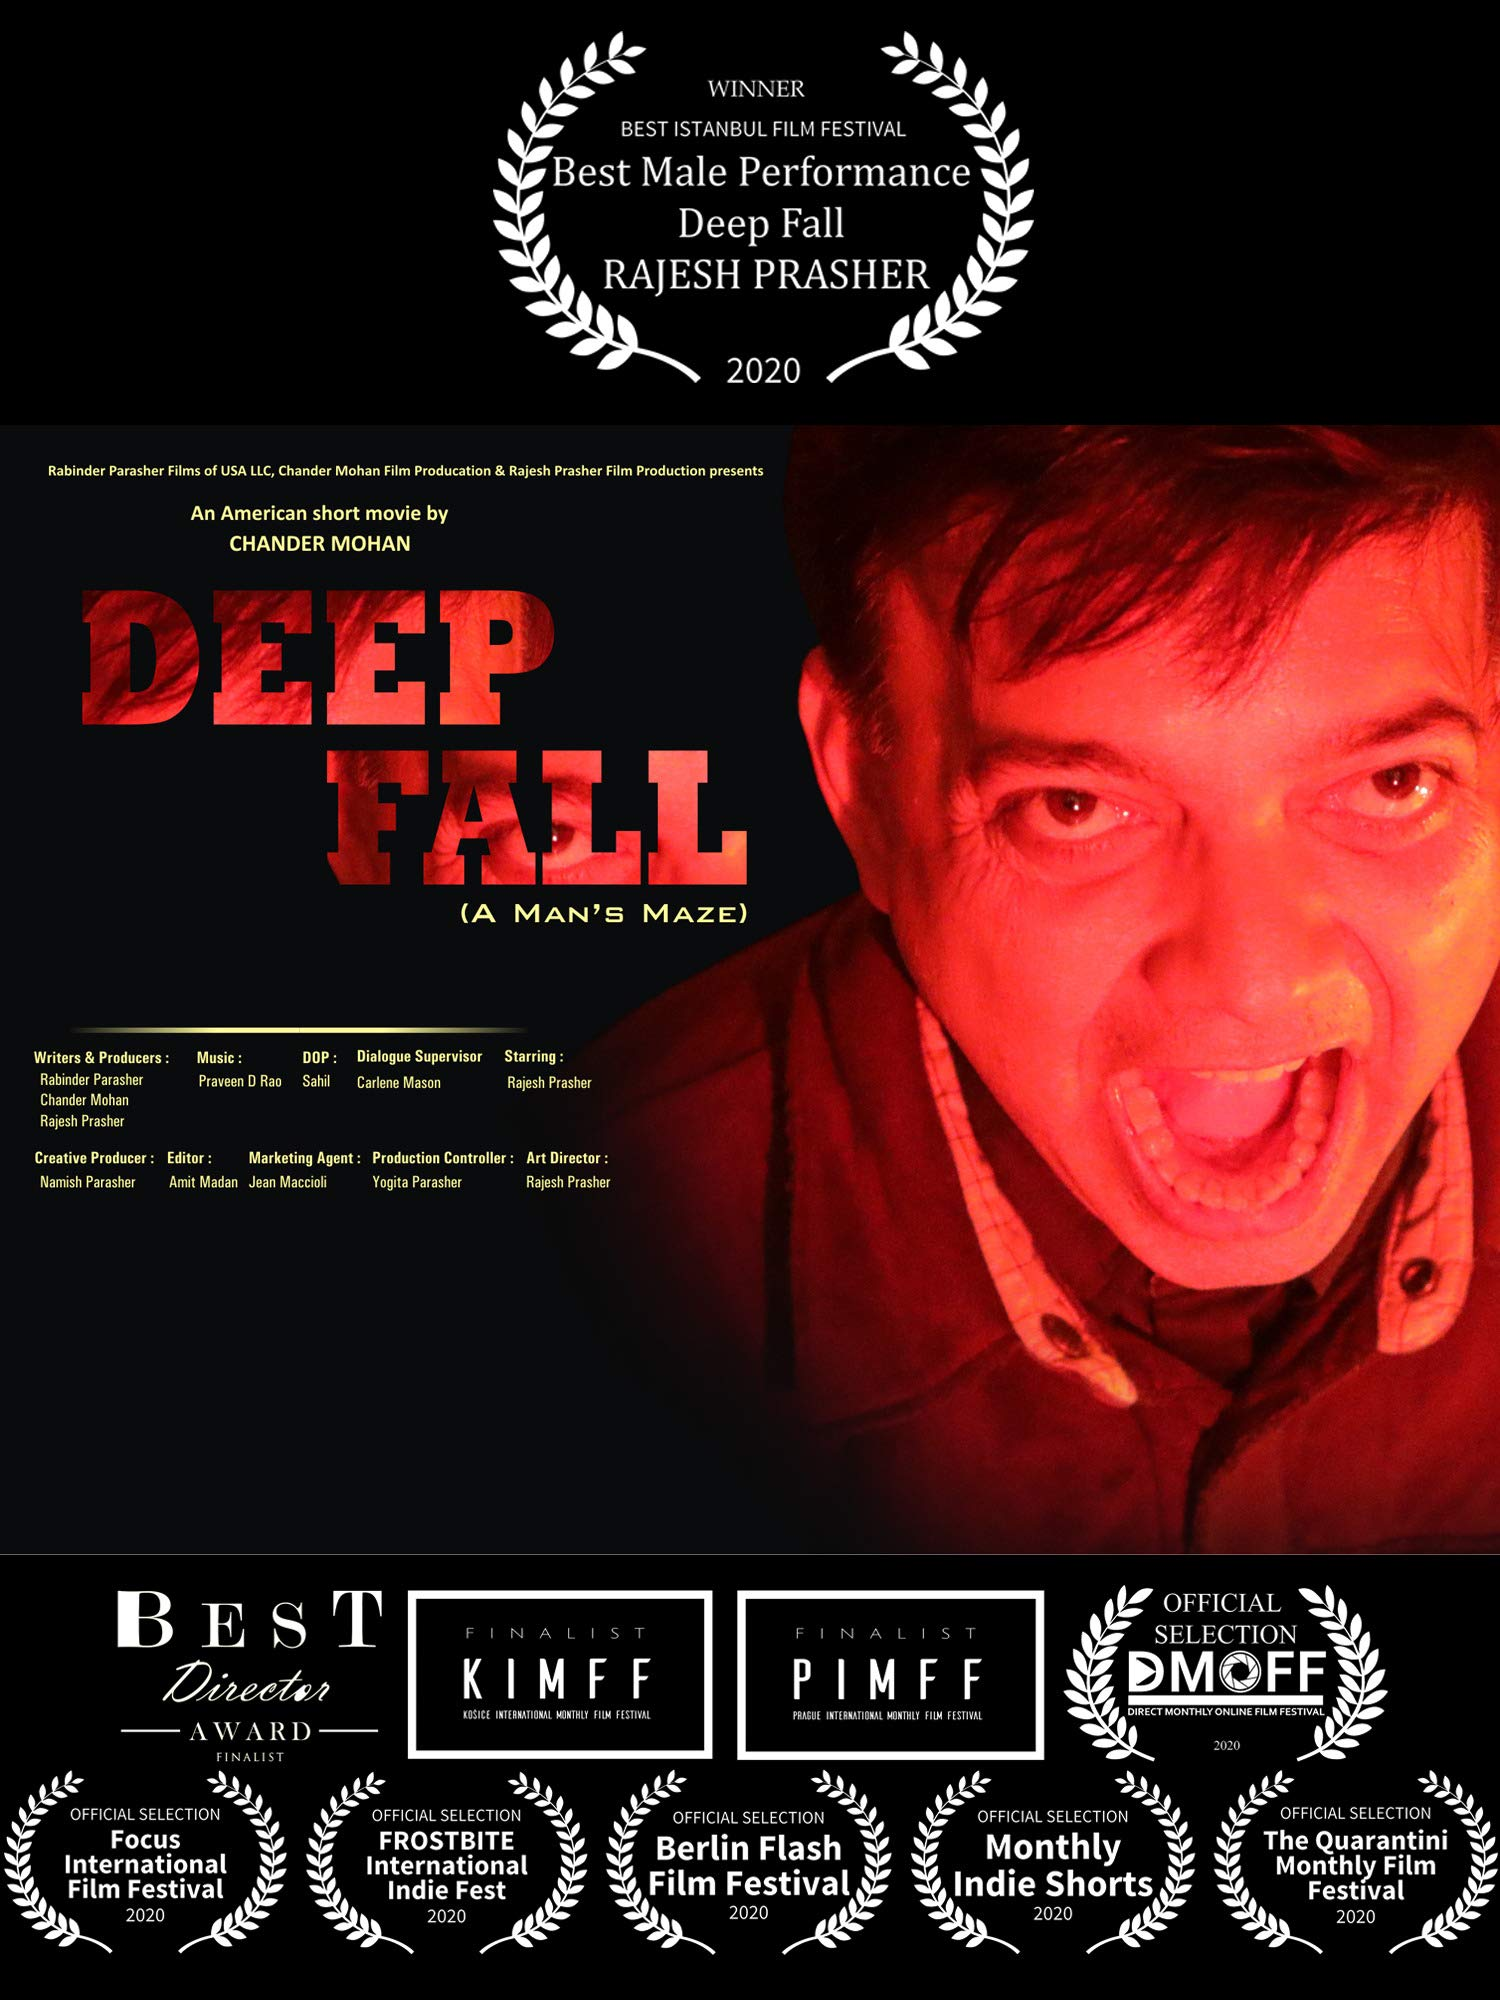 Deep Fall